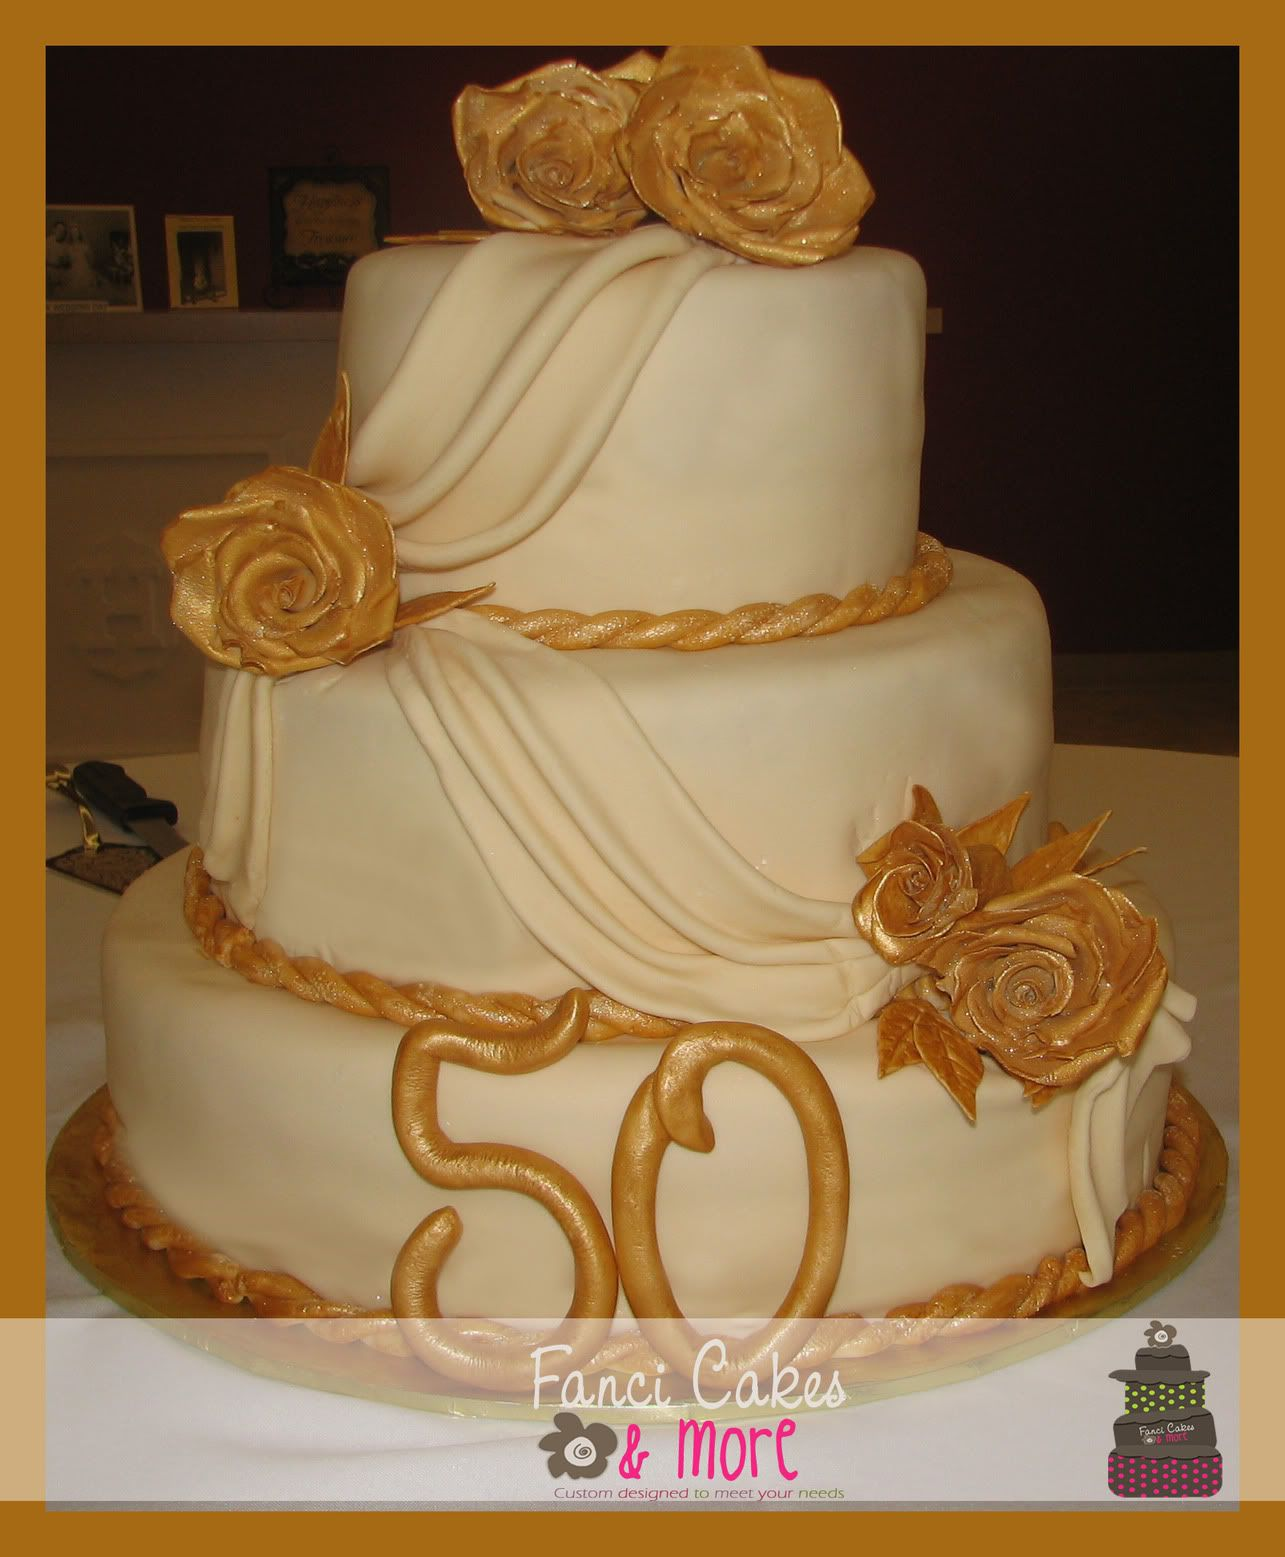 Fanci Cakes & More: 50th Anniversary